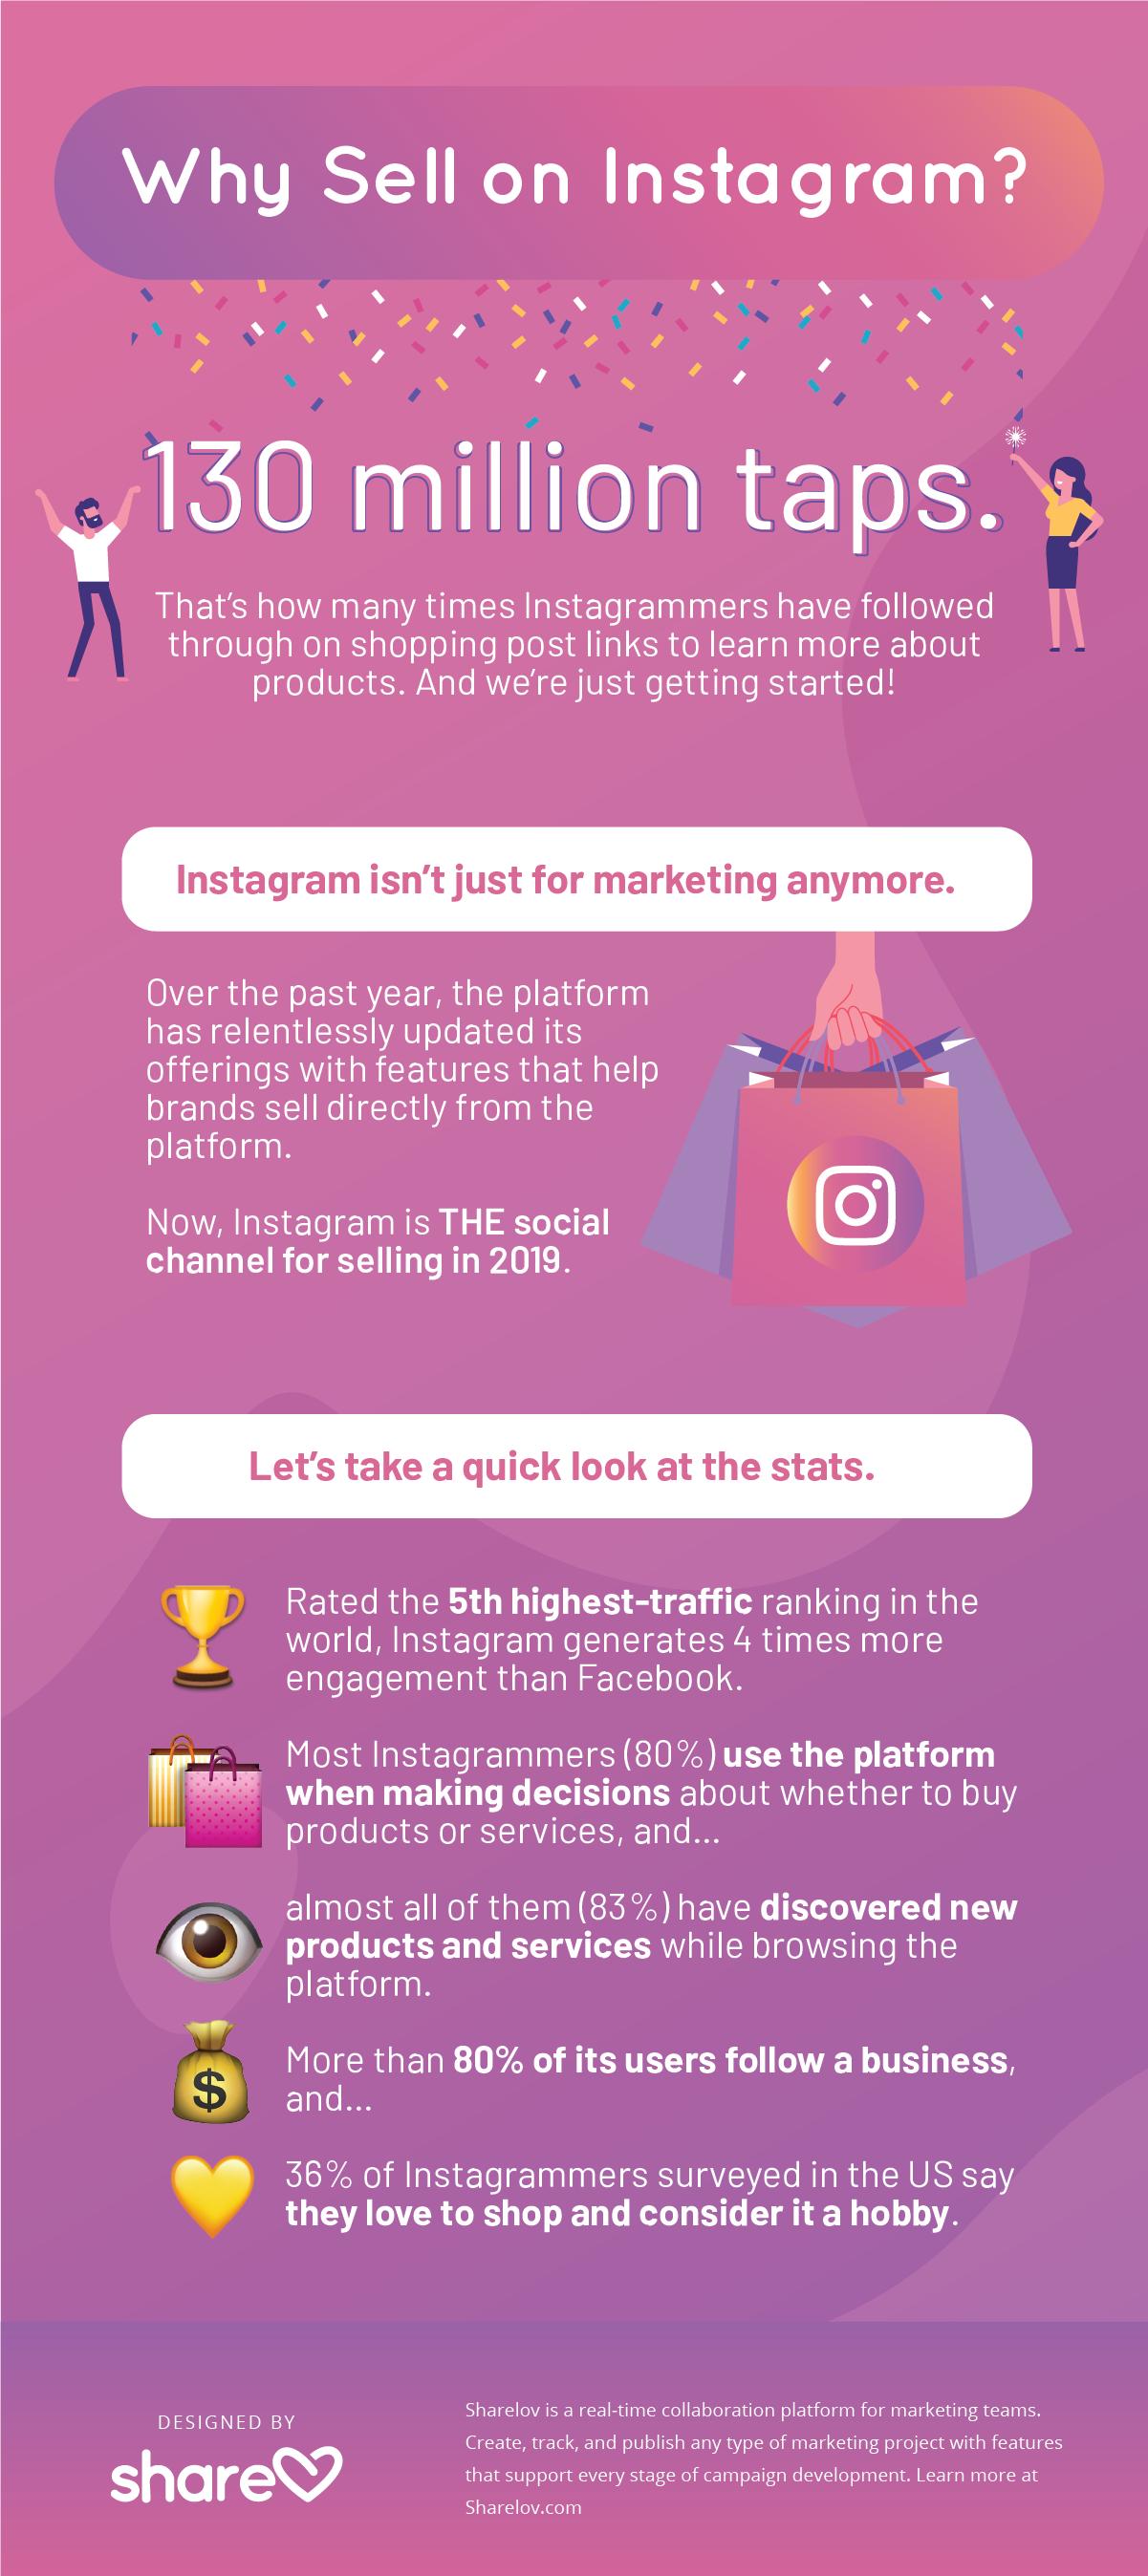 Bonus content - Why Sell on Instagram?